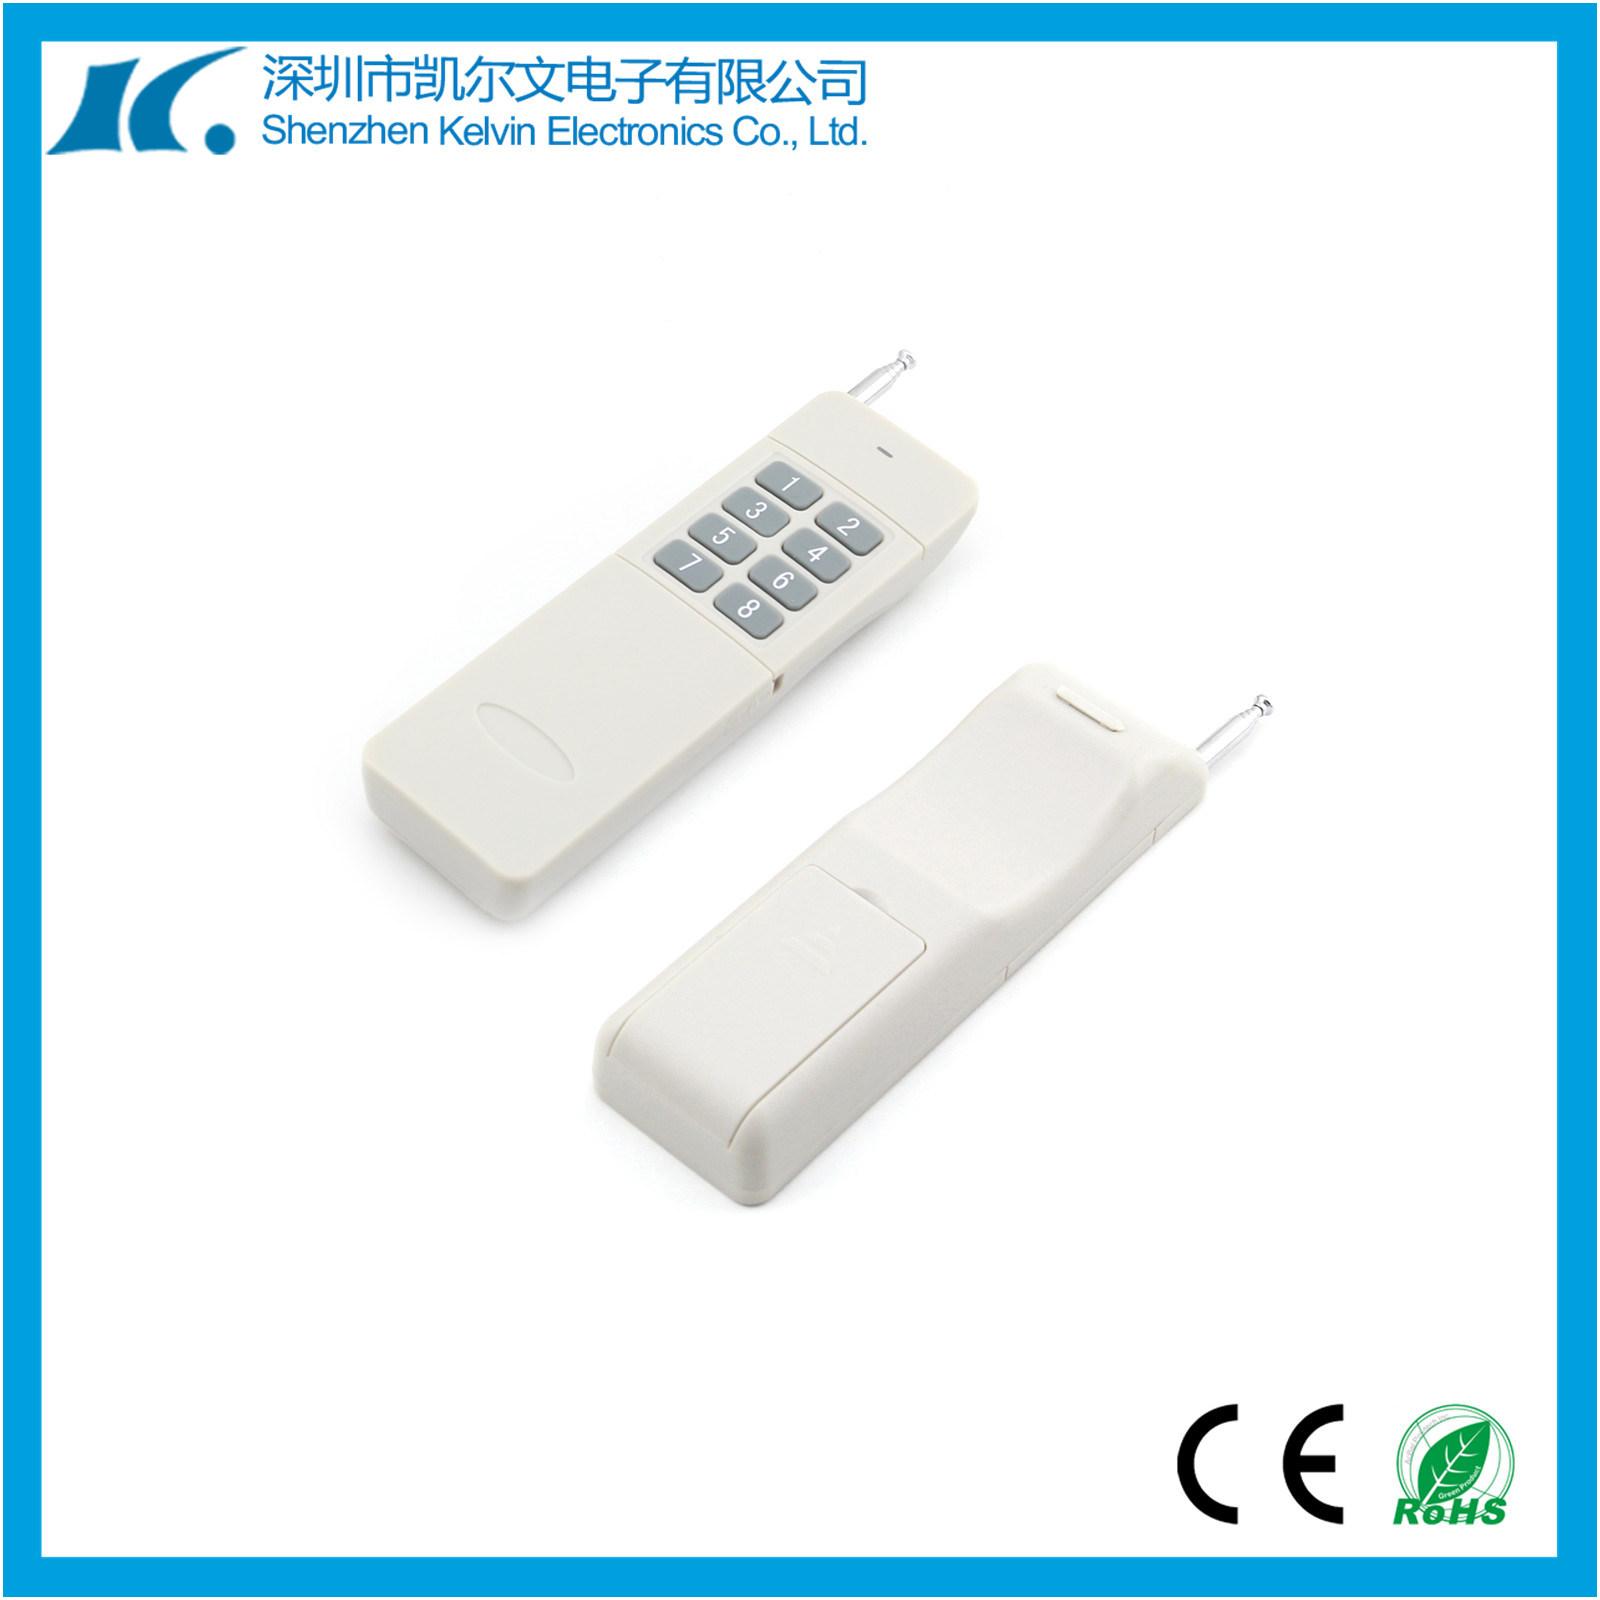 5km Univesal Wireless RF Lora Remote Control Kl5000